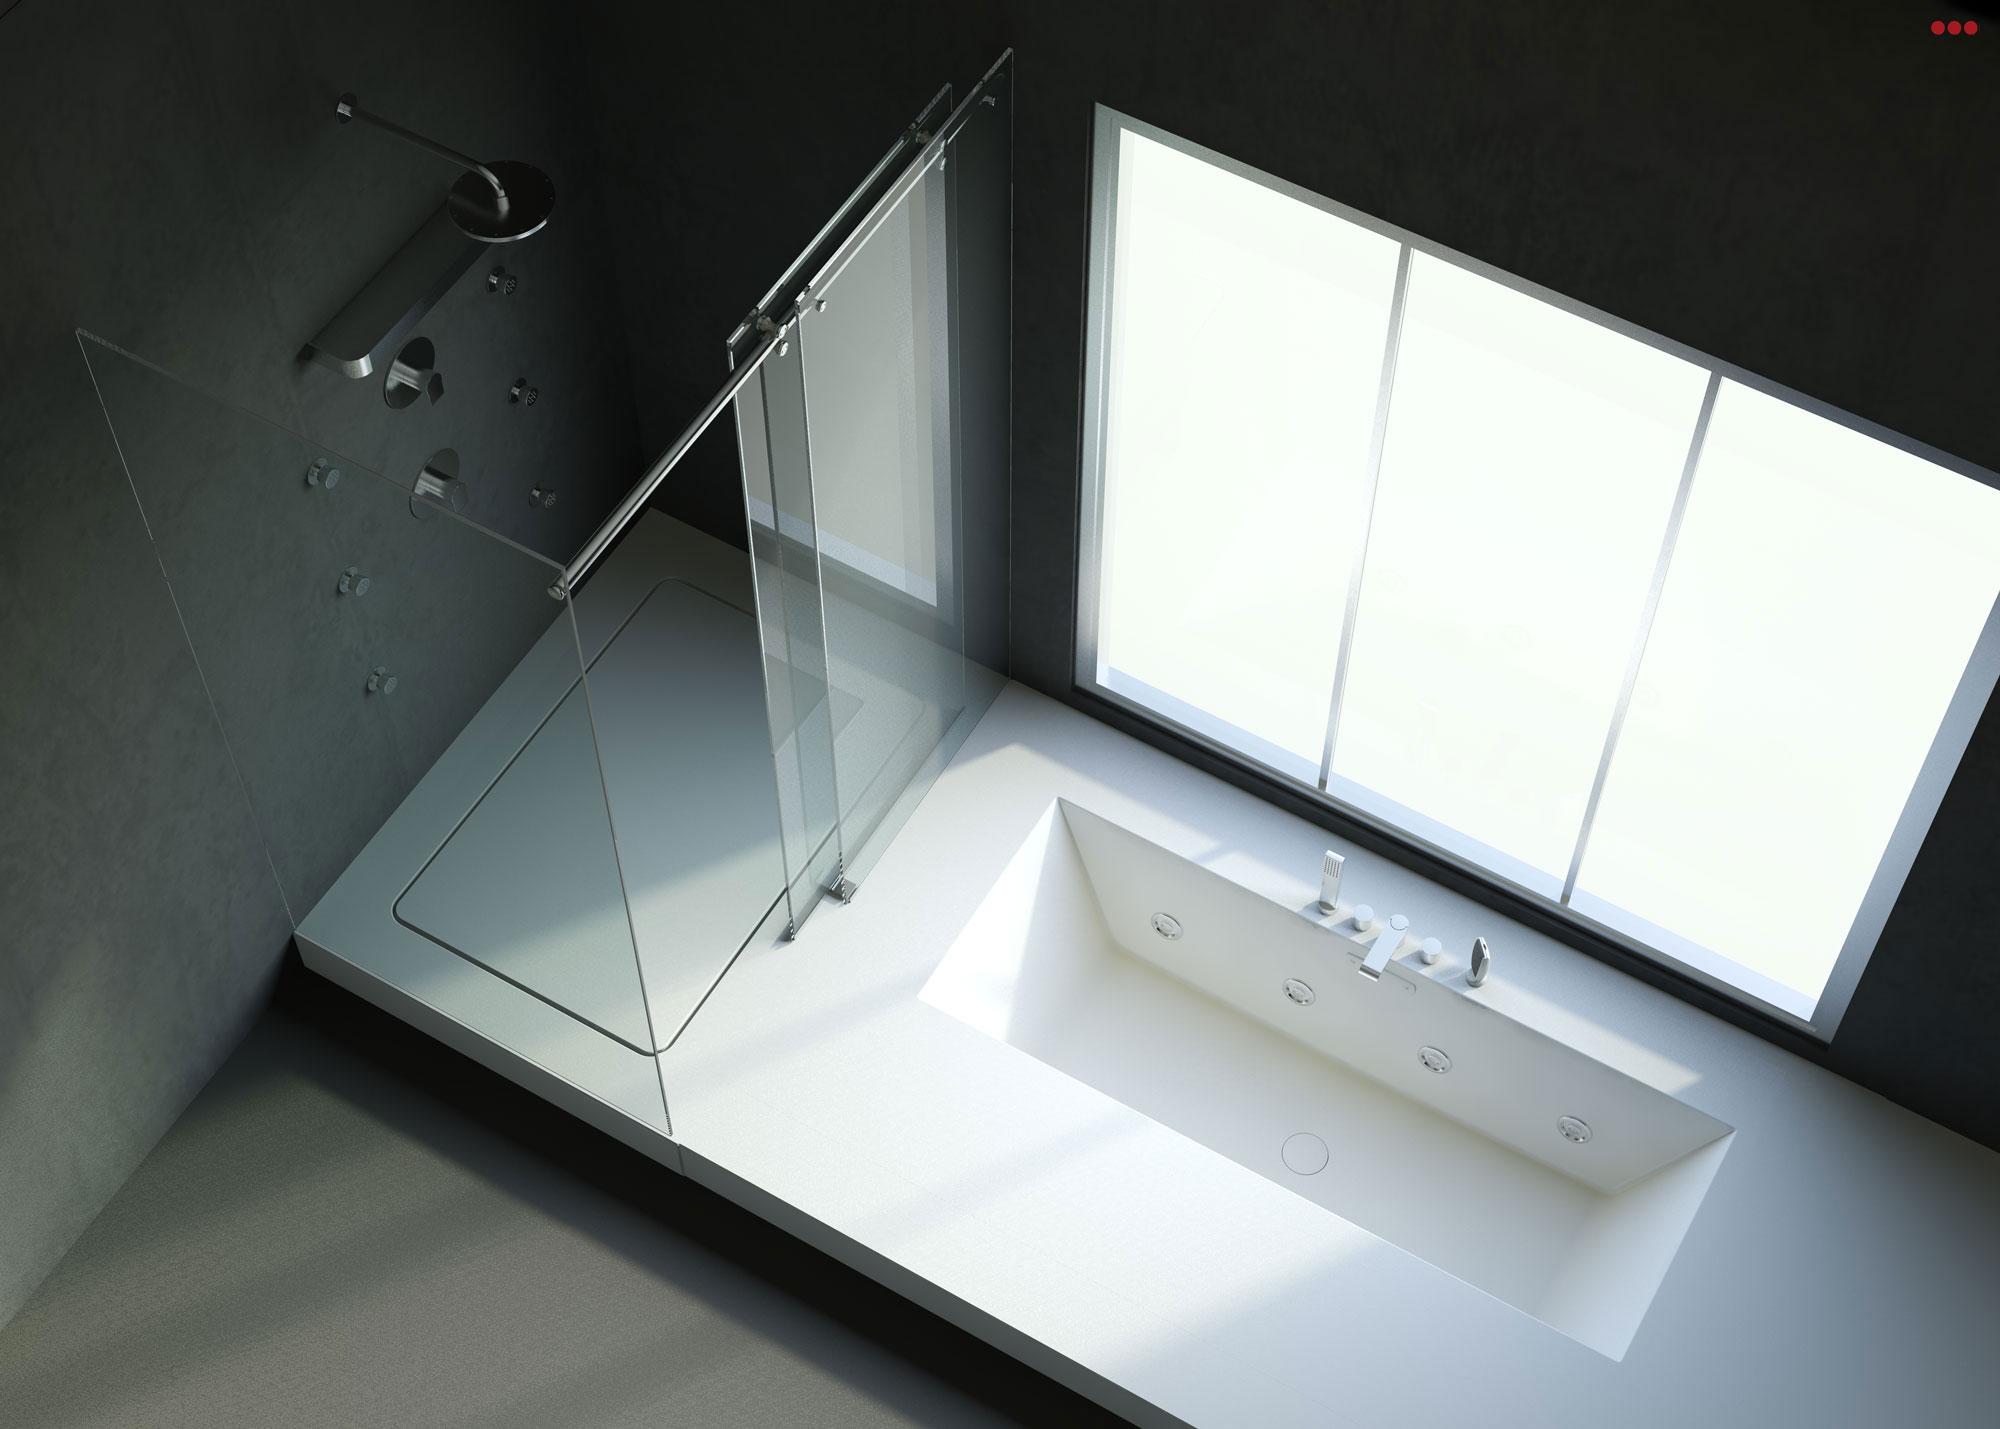 arredo bagni - 3d studio bartolini - grafica e rendering 3d - Arredo Bagno Rimini